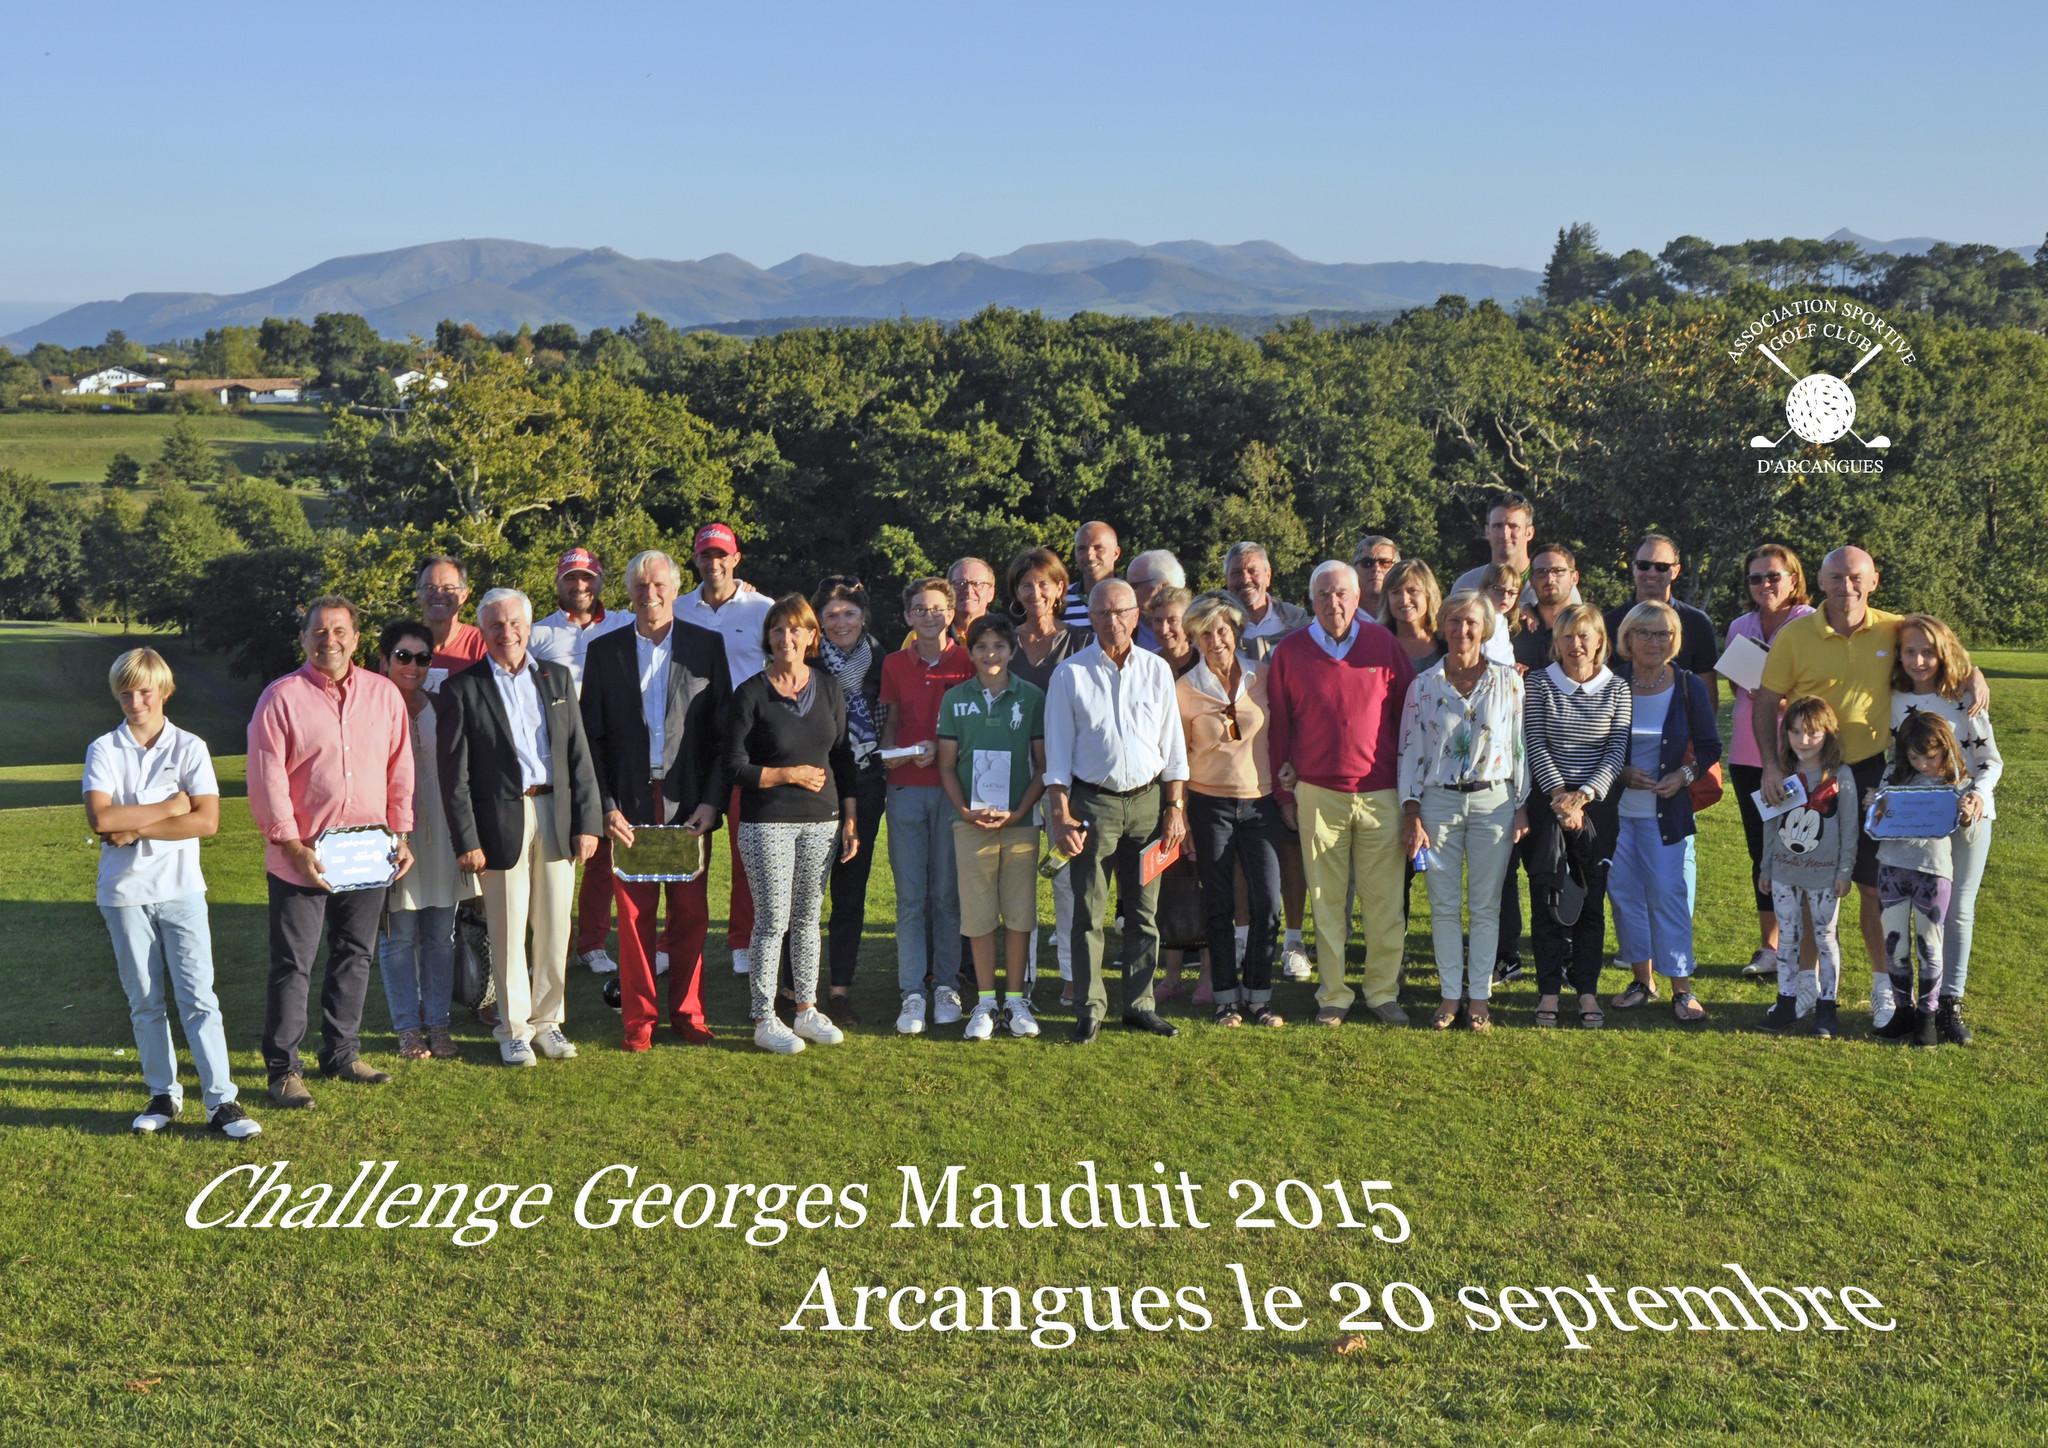 Challenge Georges Mauduit 2015